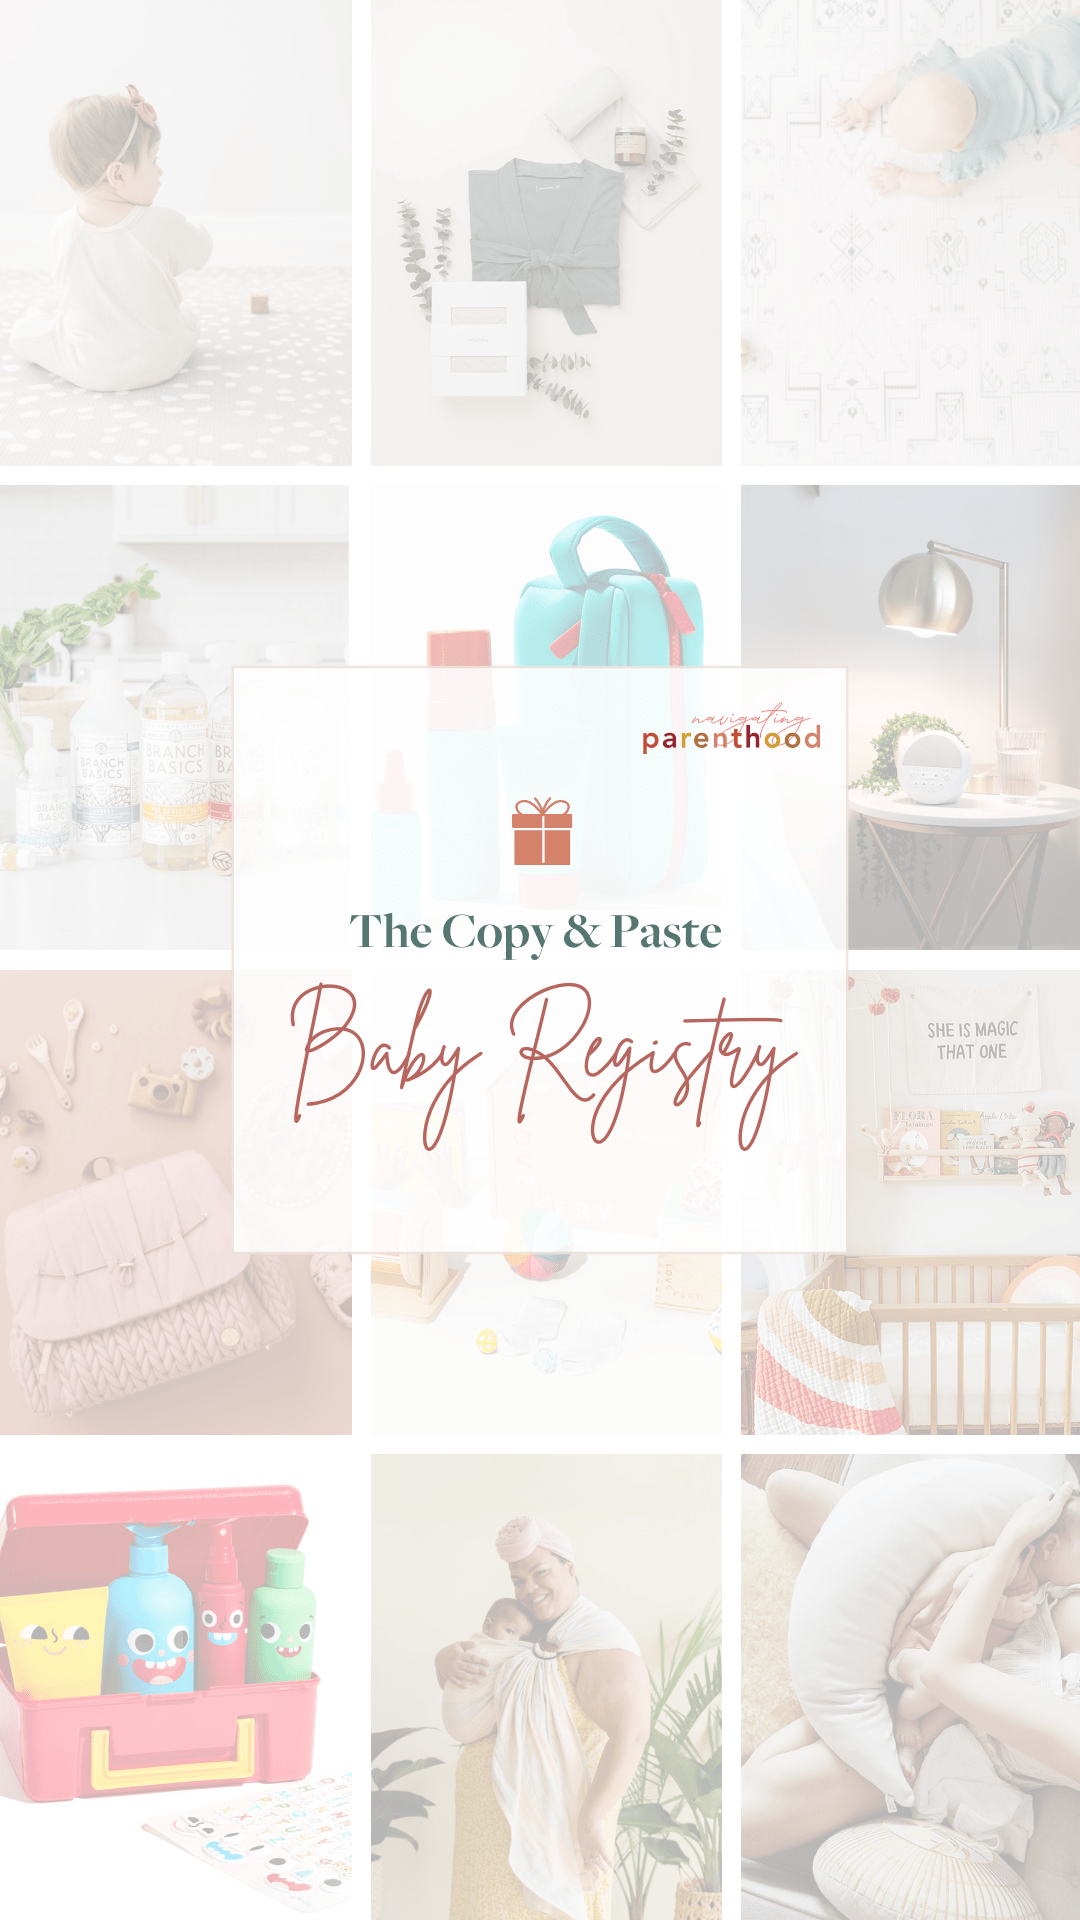 The Copy & Paste Baby Registry